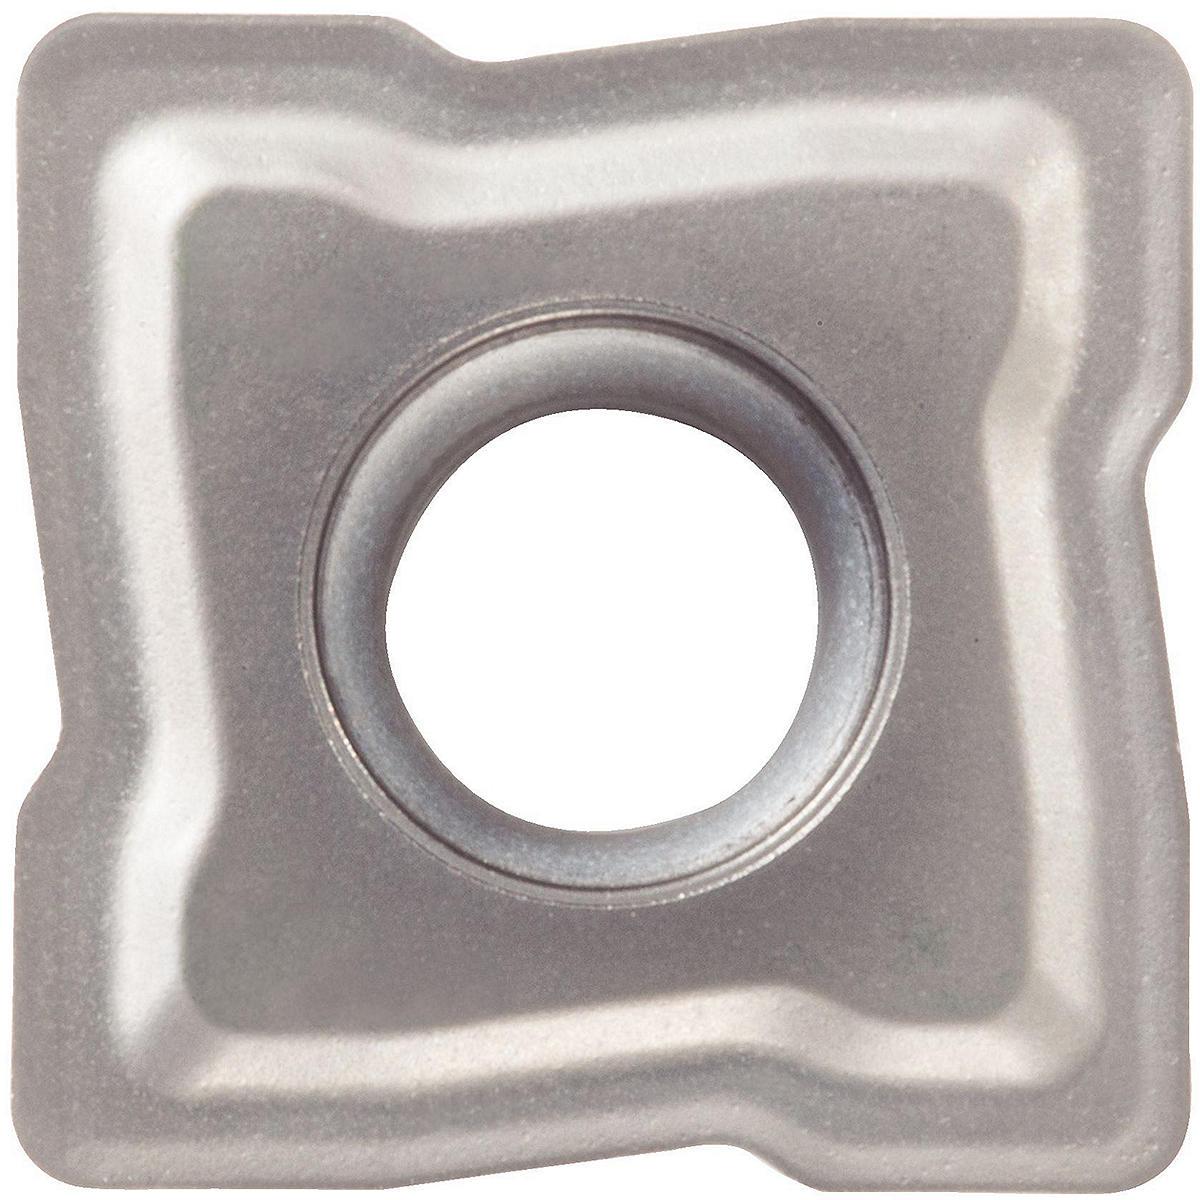 TC4 • Periphery Inserts • Aluminum • V36